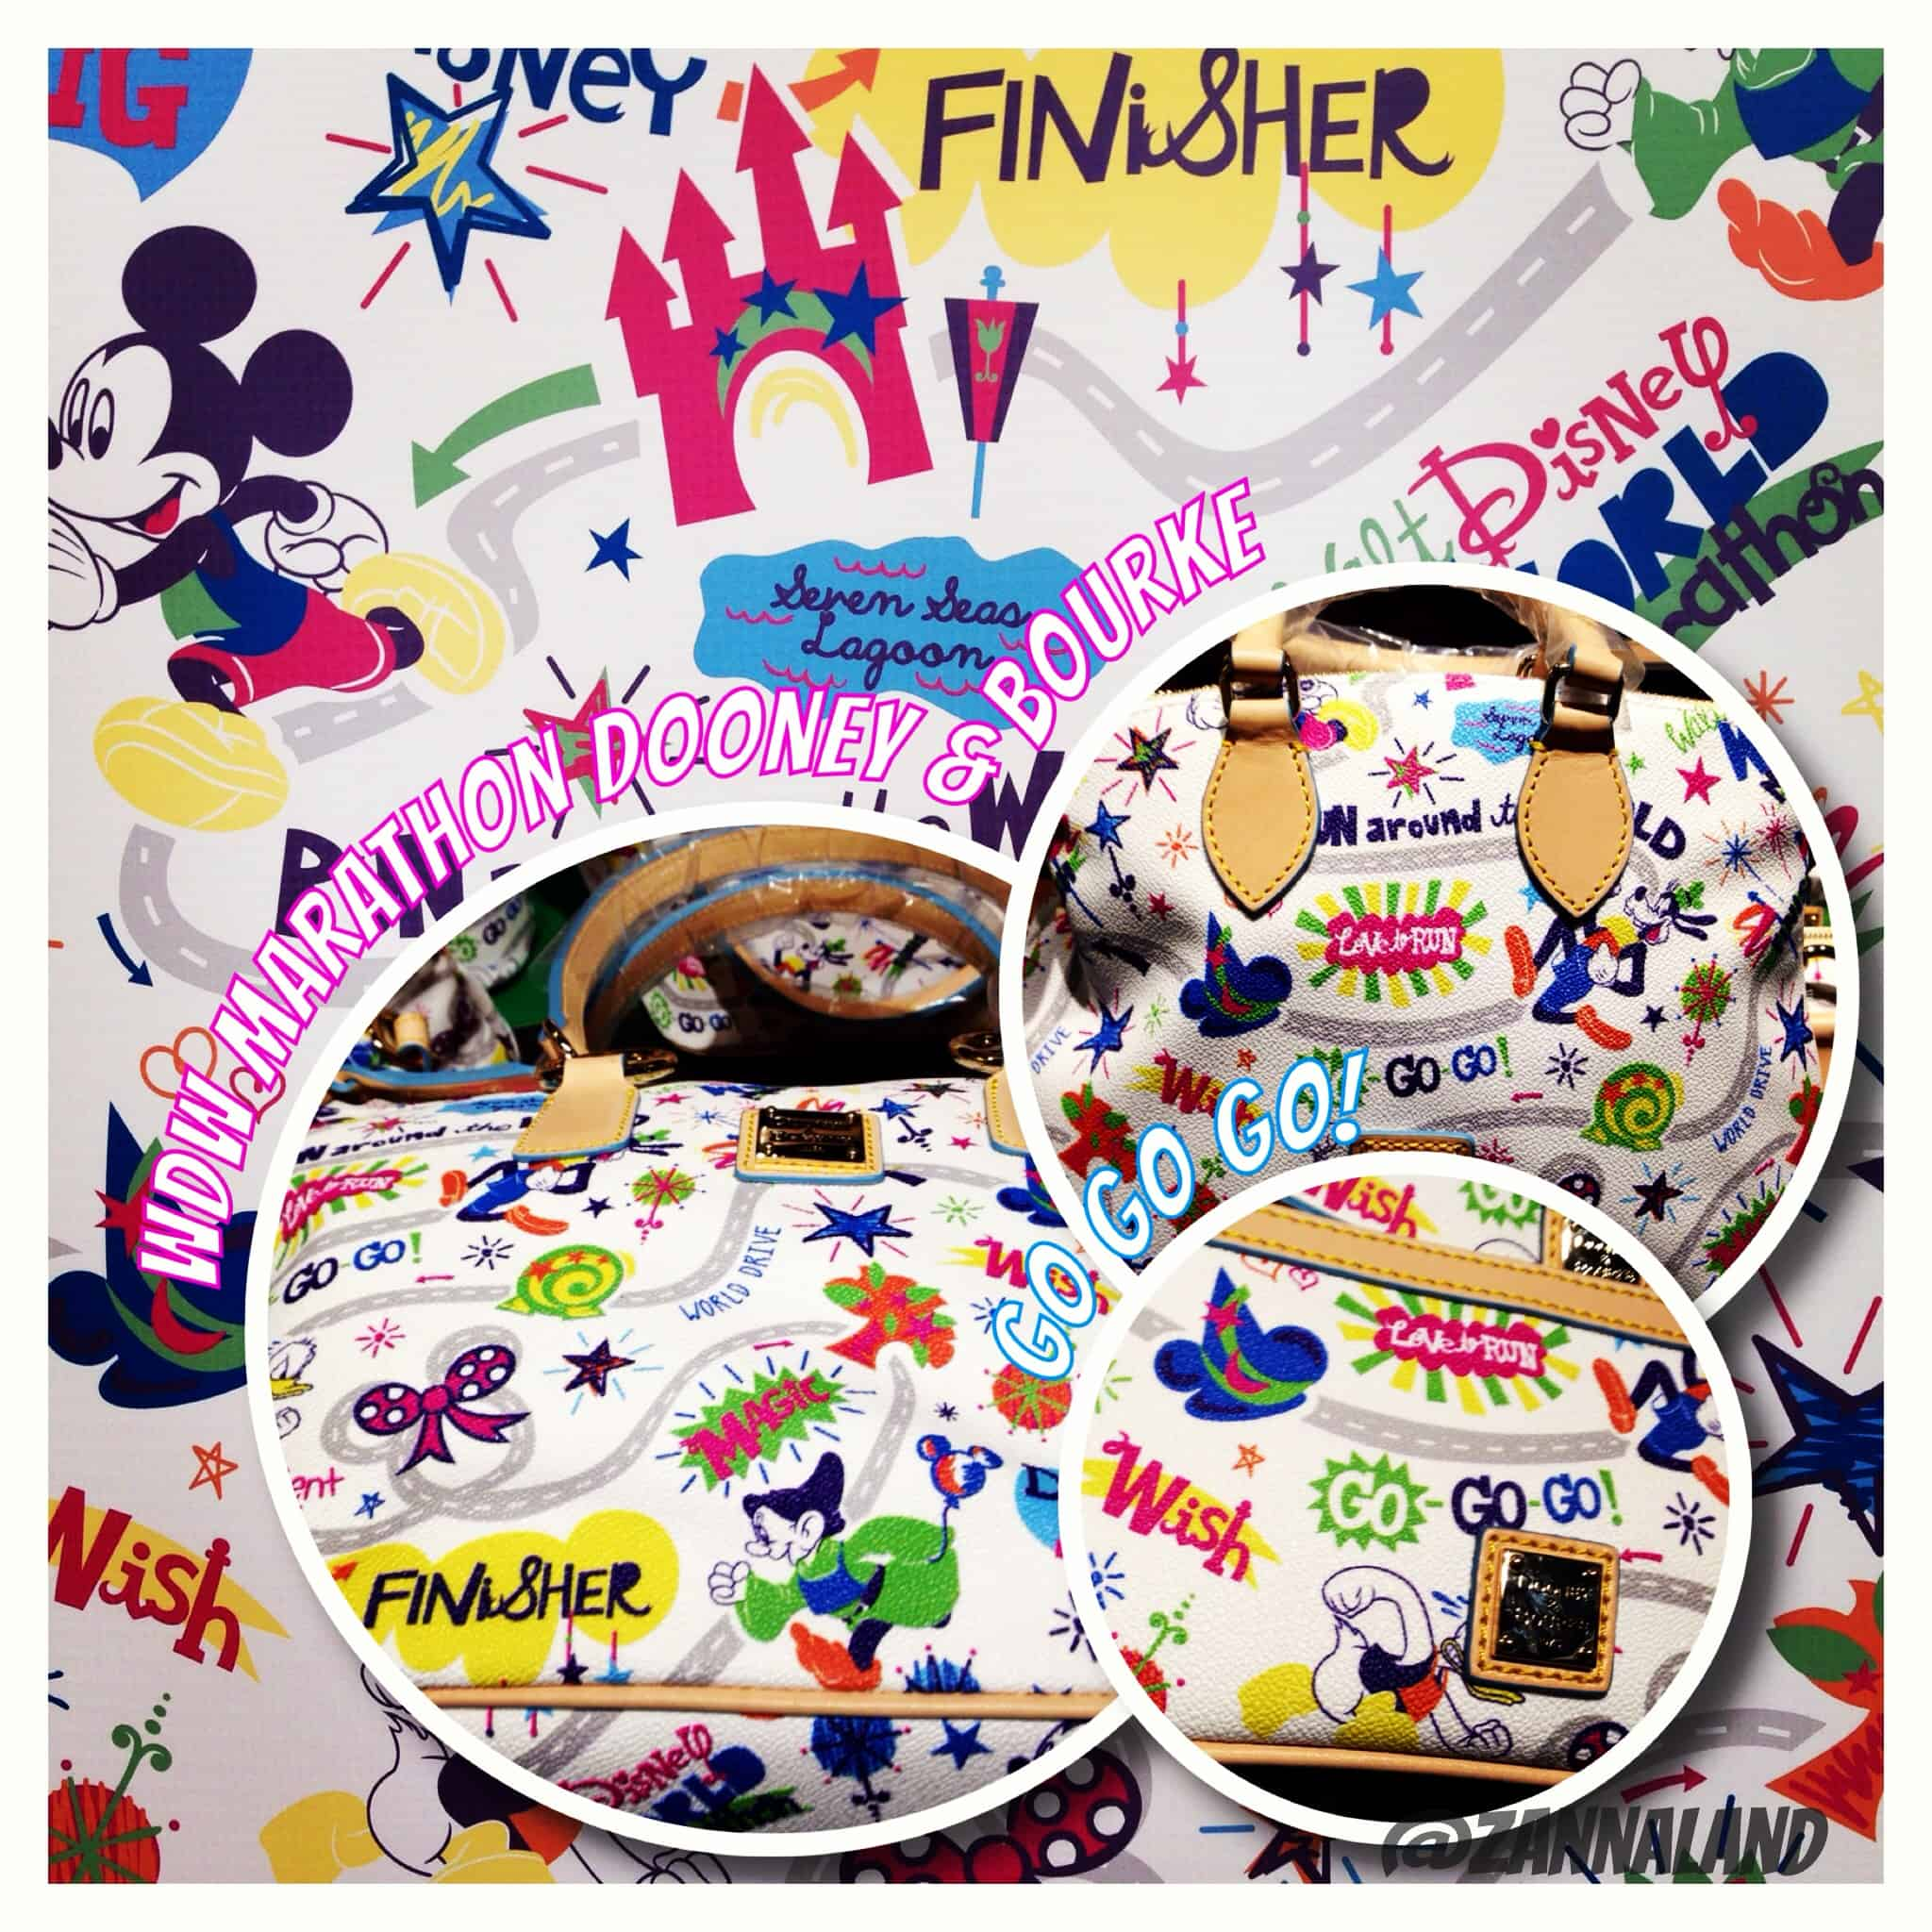 NEW! 2014 Walt Disney World Marathon Dooney and Bourke Bags